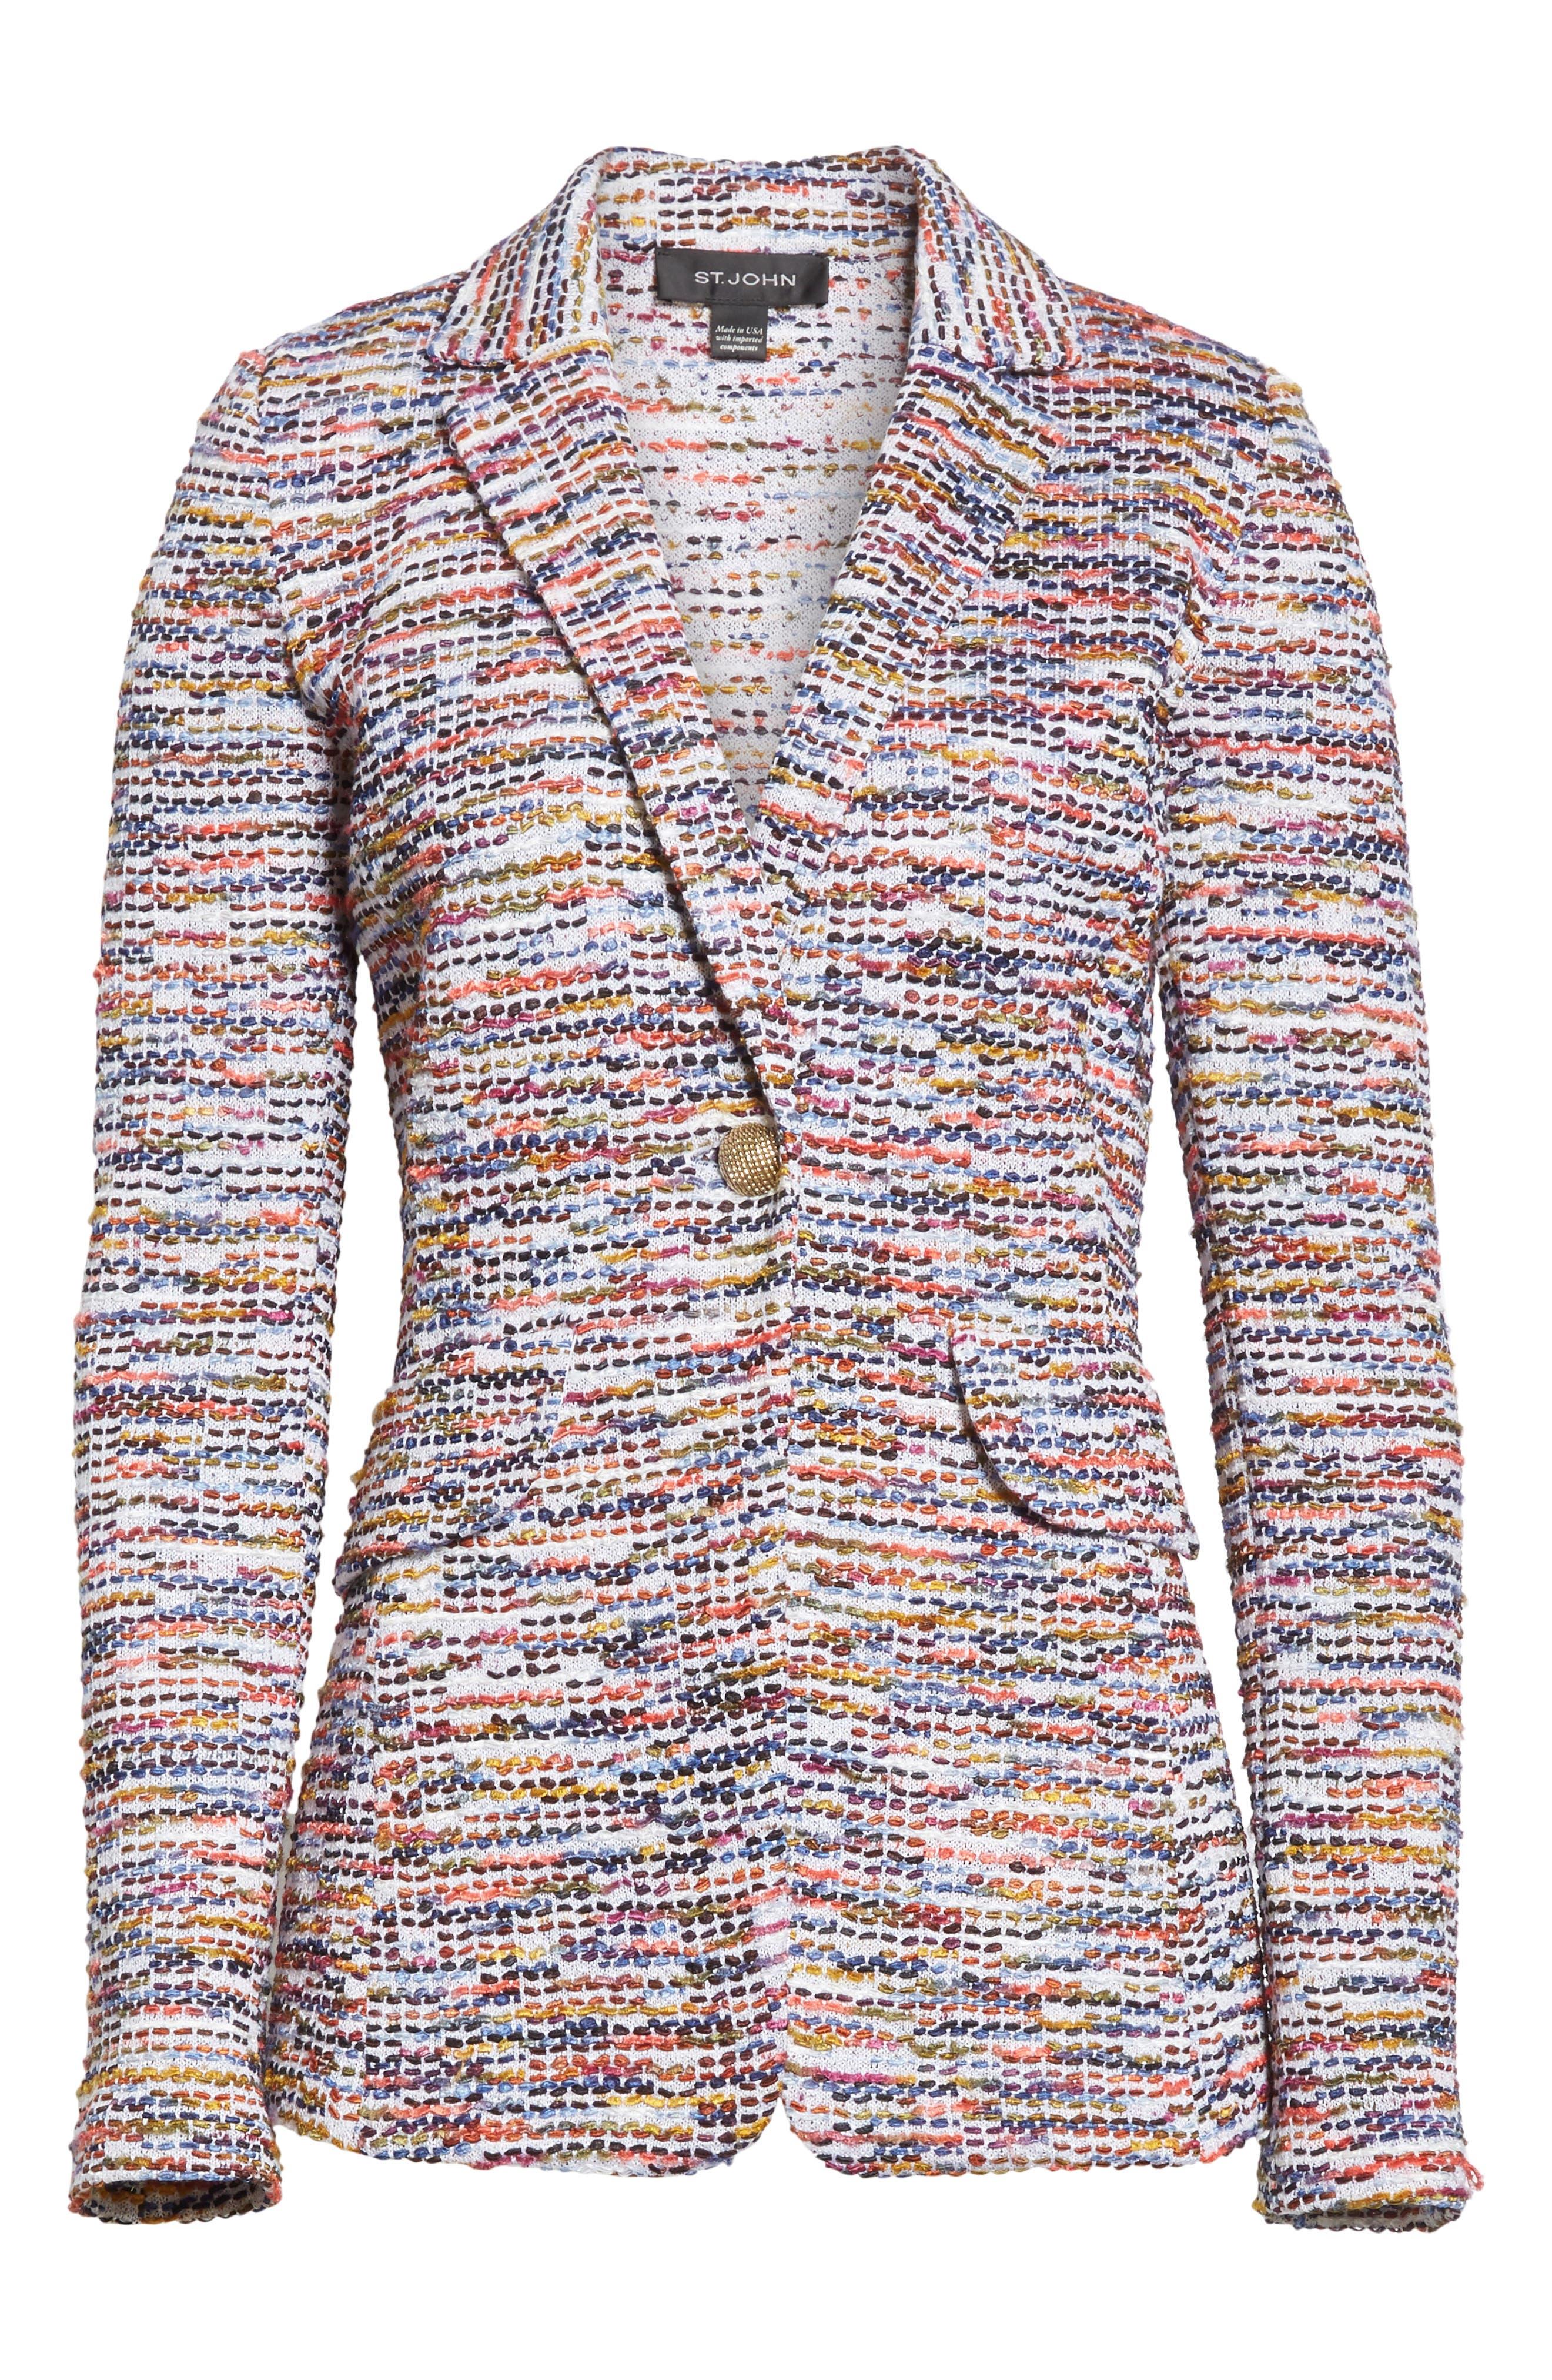 Vertical Fringe Multi Tweed Knit Jacket,                             Alternate thumbnail 7, color,                             Sienna Multi